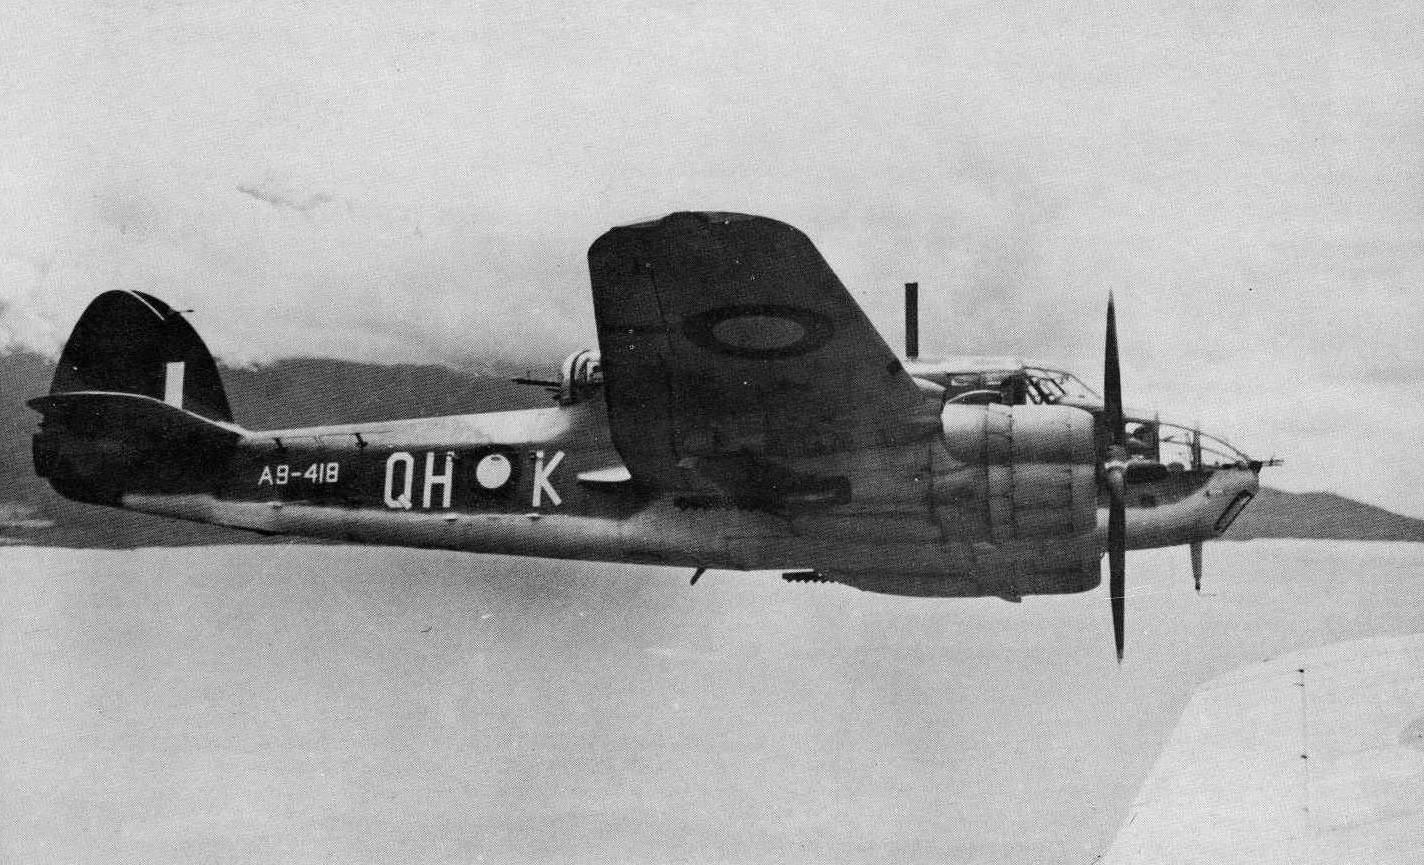 Bristol-Beaufort-MkVIM-RAAF-100Sqn-QH-K-A9-418-off-the-coast-of-New-Britain-1945-AWM-01